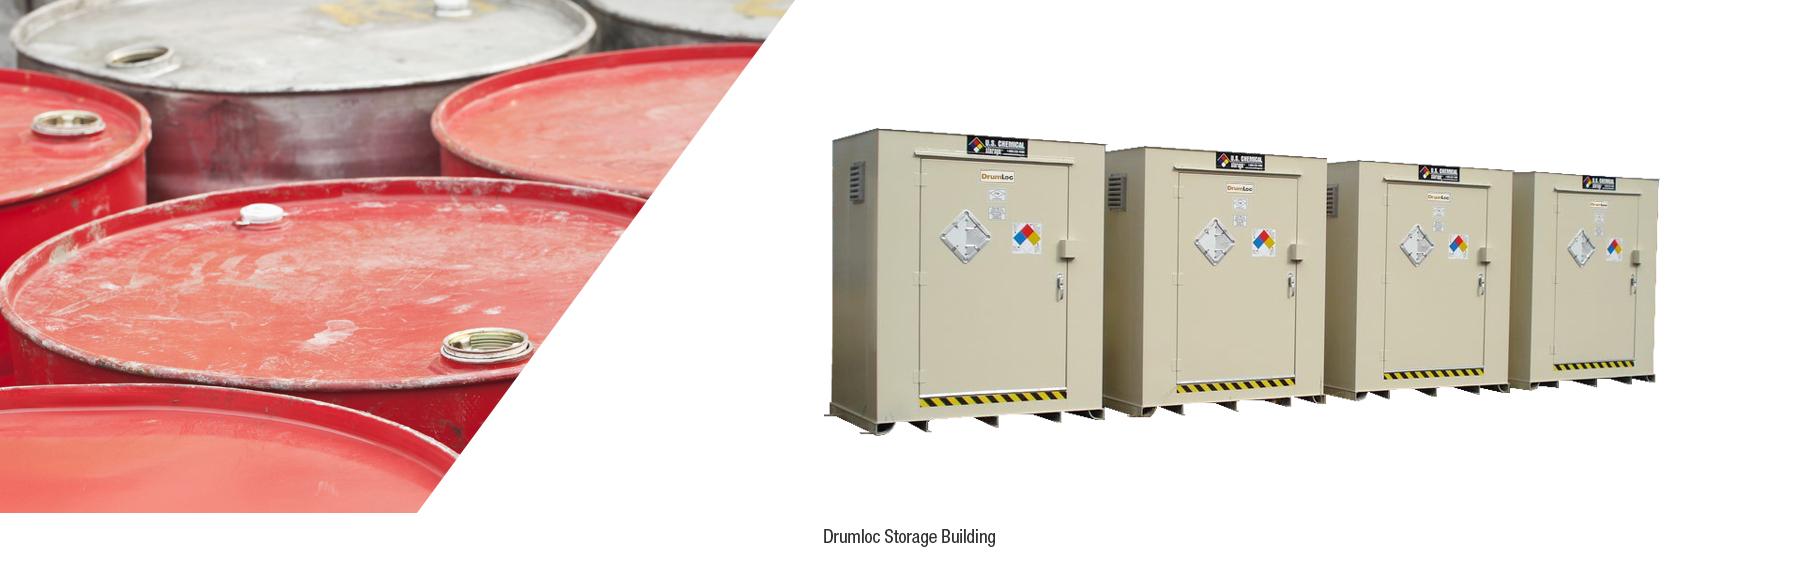 U.S. Chemical Storage drum storage building.